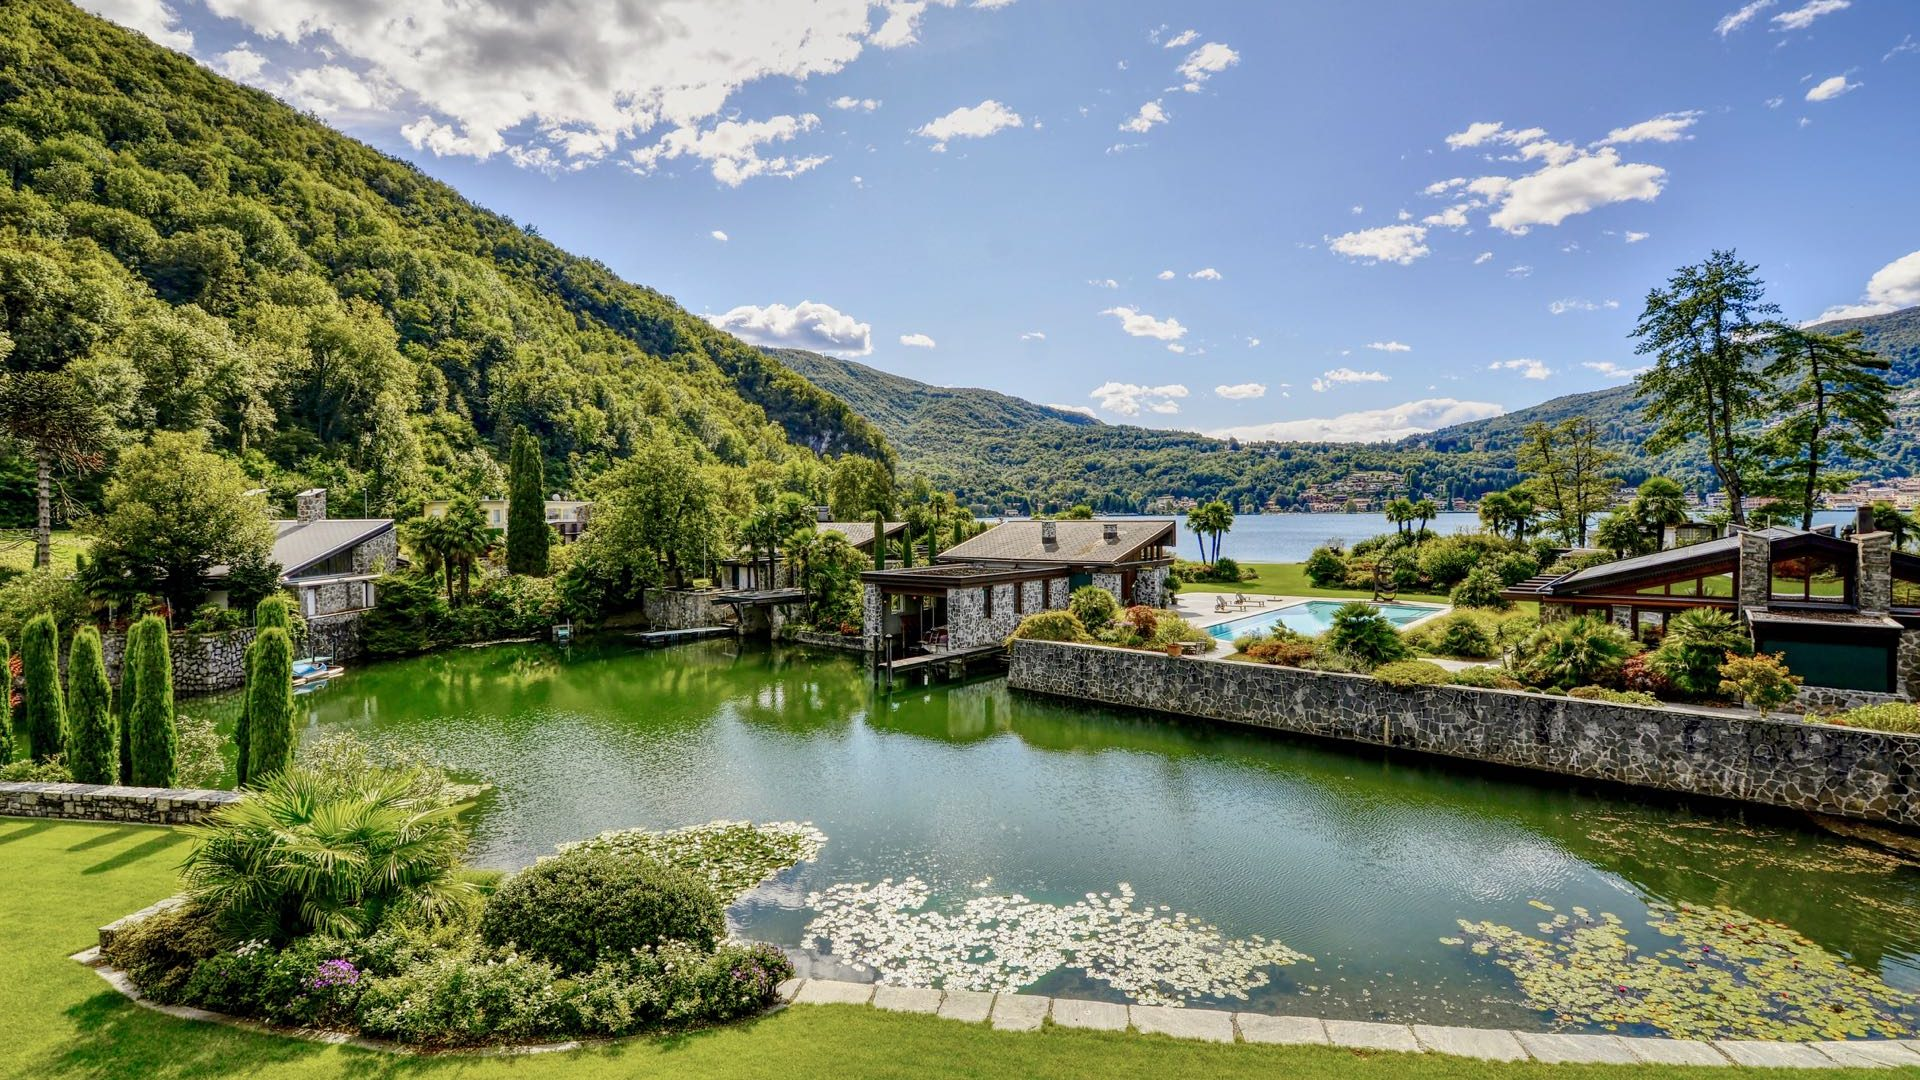 Splendid views of the lake